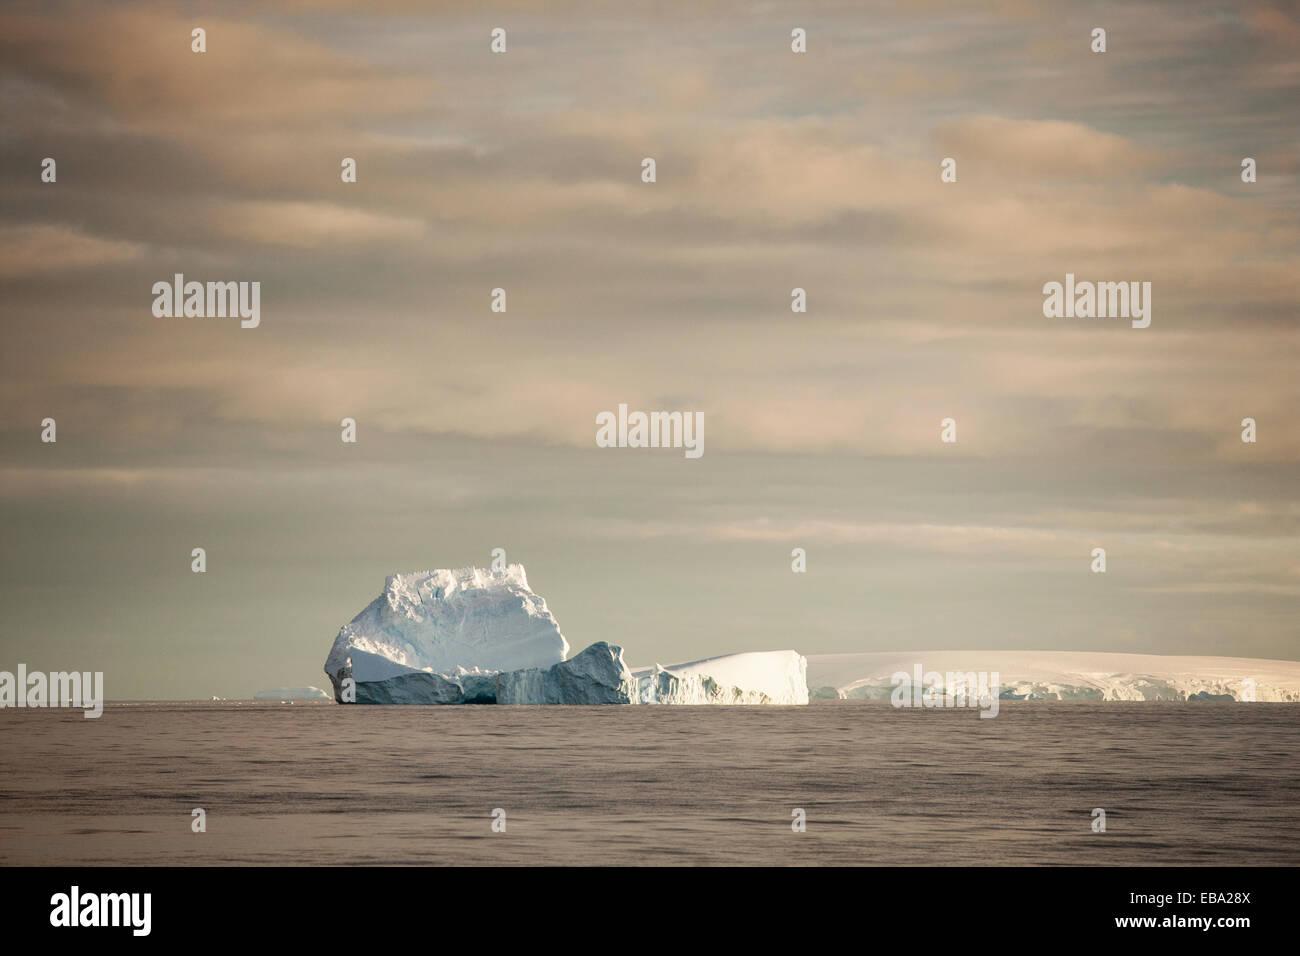 Icebergs in the morning light, Antarctic Peninsula, Antarctica - Stock Image